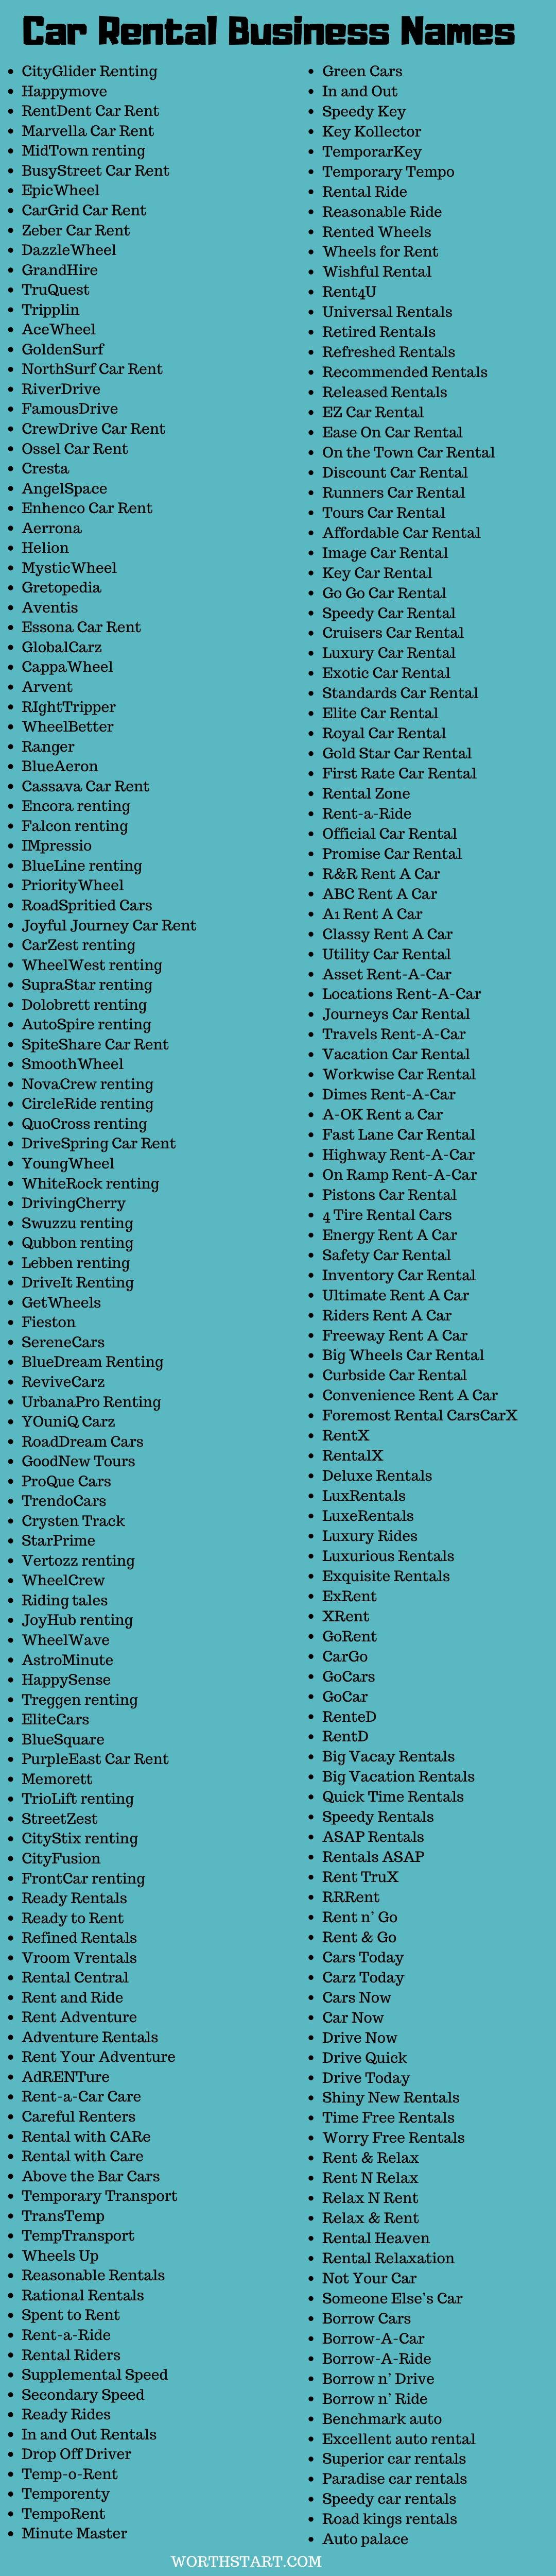 Jeep Name Ideas : ideas, Rental, Company, Names, Ideas, Business